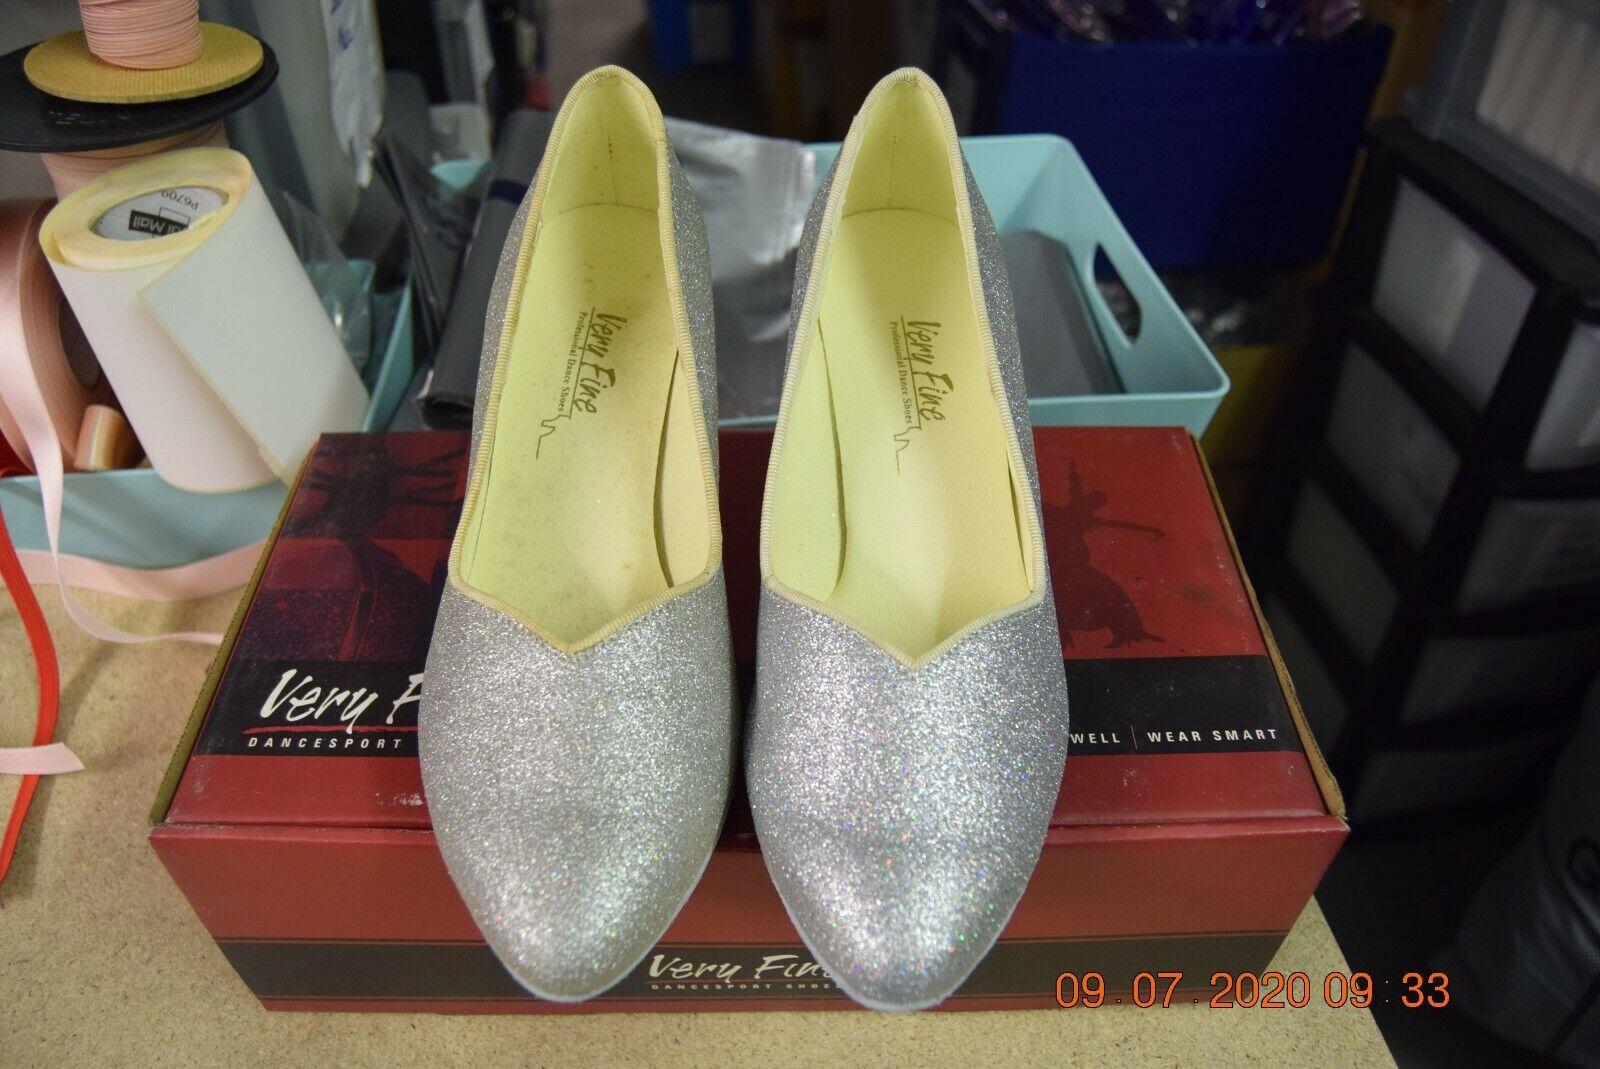 Silver glitter Very Fine Cinderella ballroom latin dance shoes - size UK 6